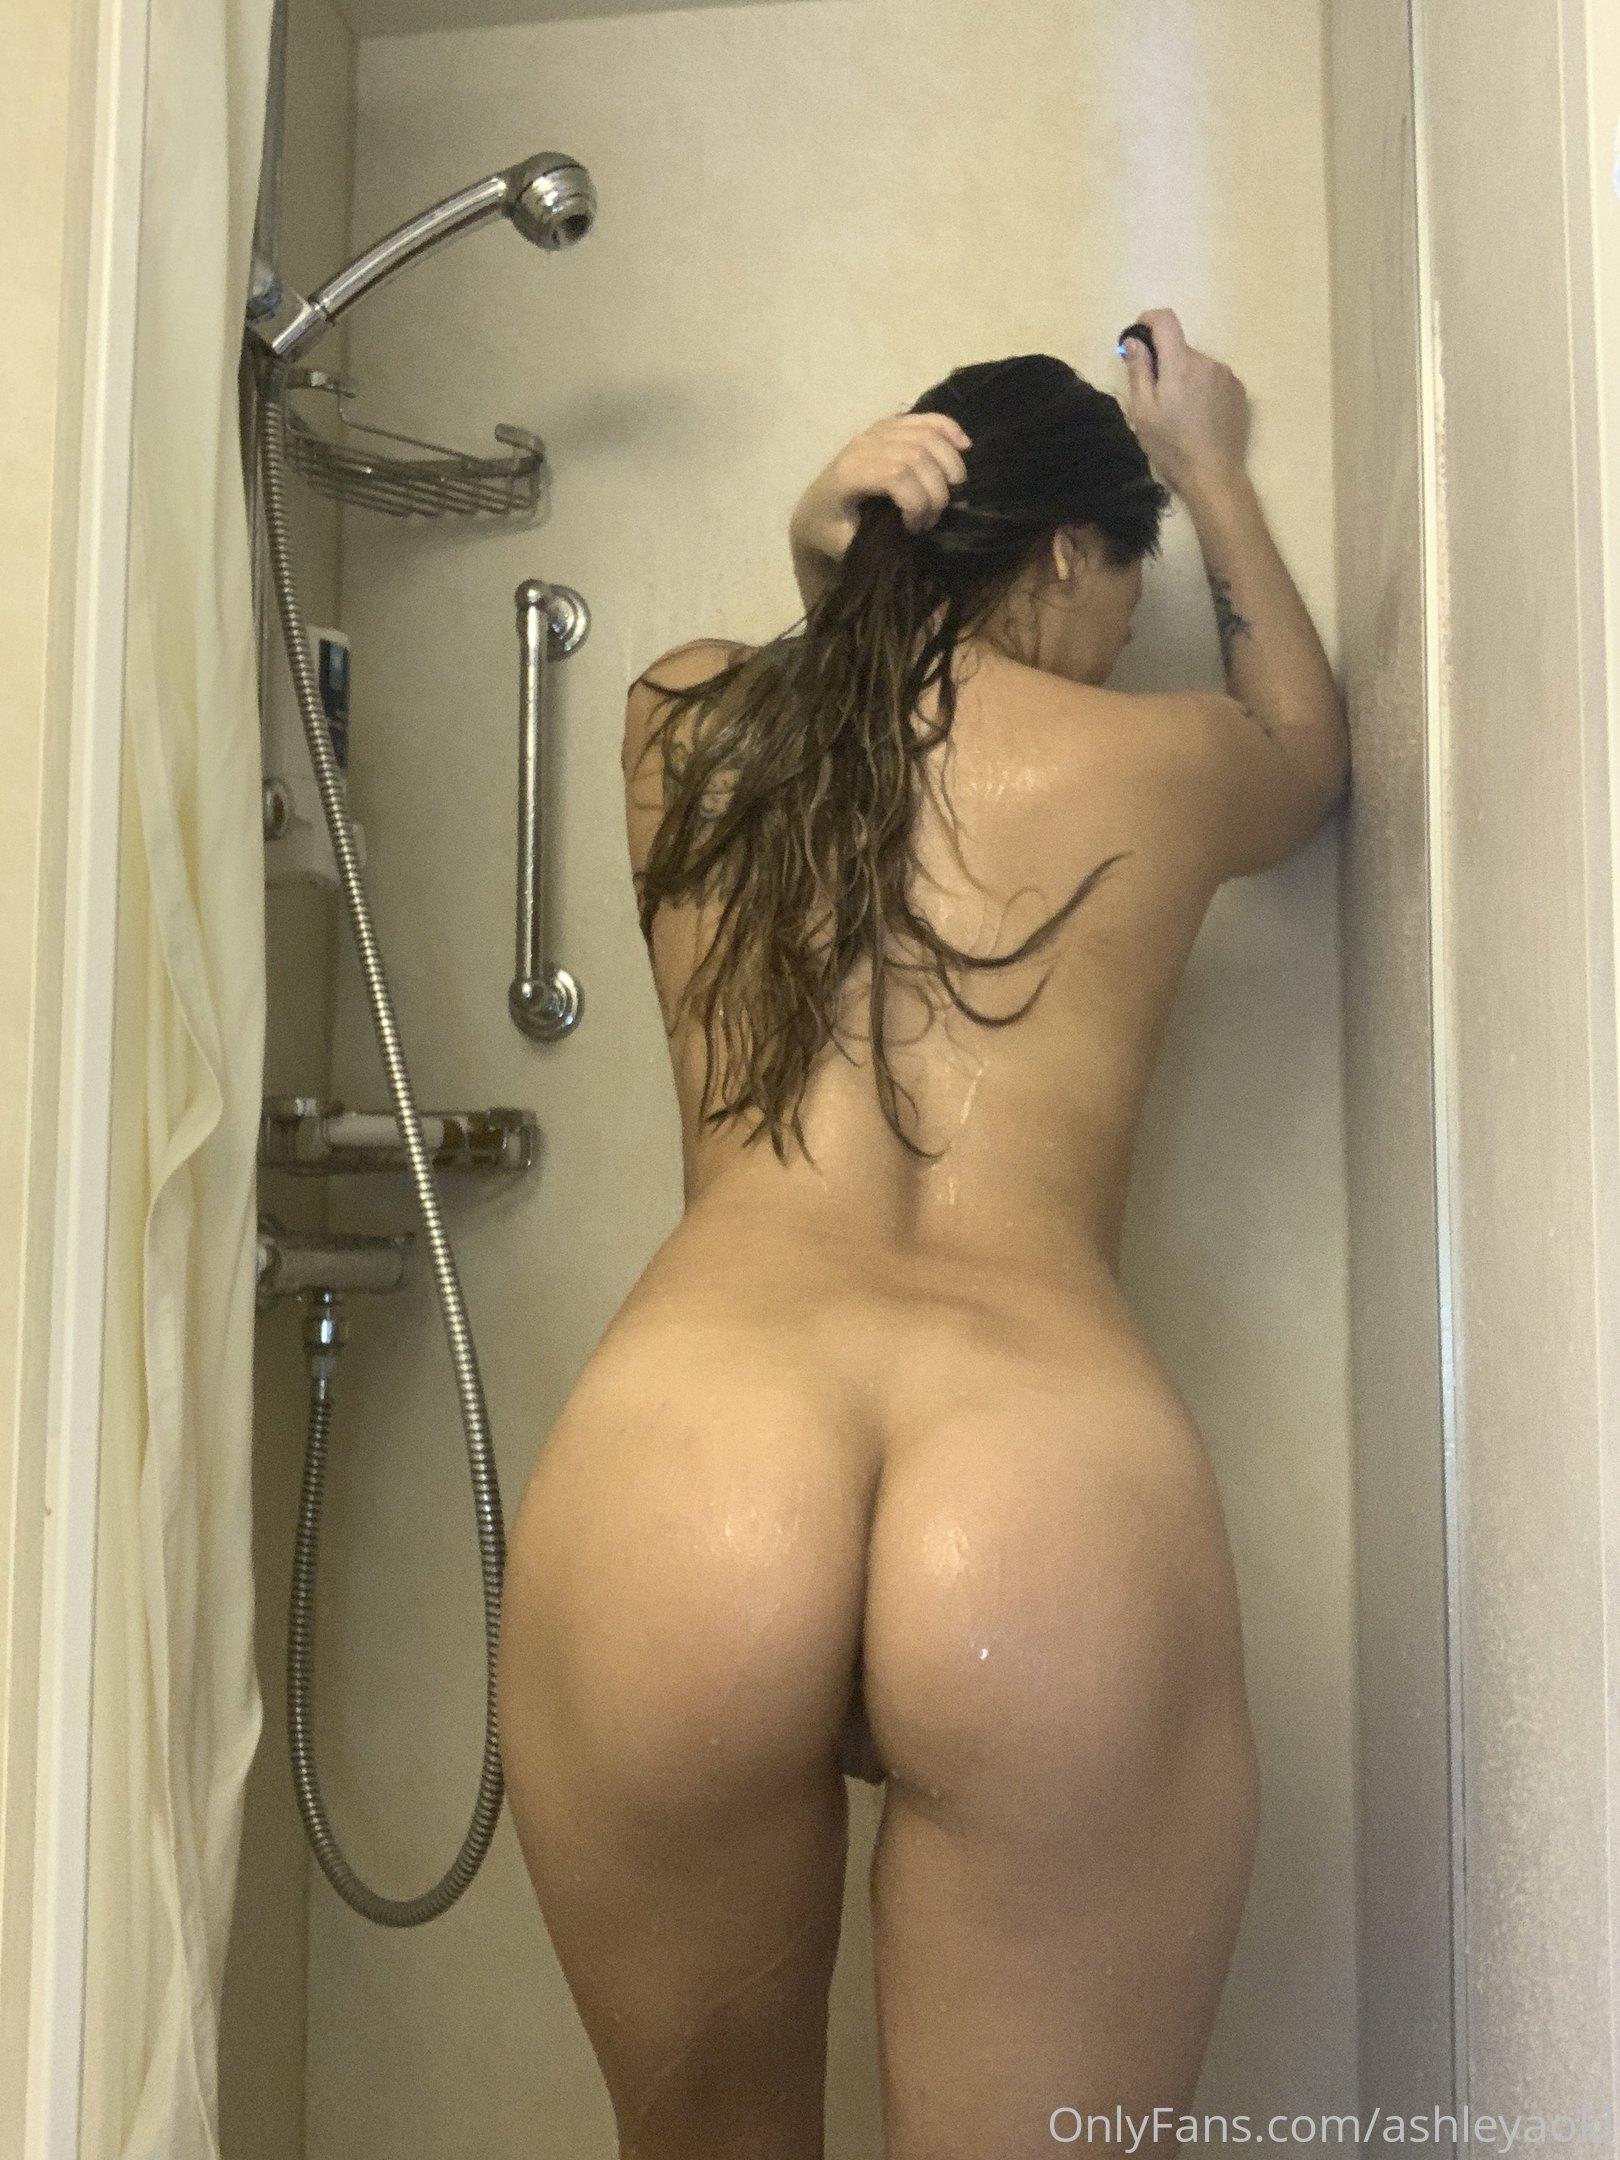 Ashley Aoki, Ashleyaoki, Onlyfans Leaks 0232